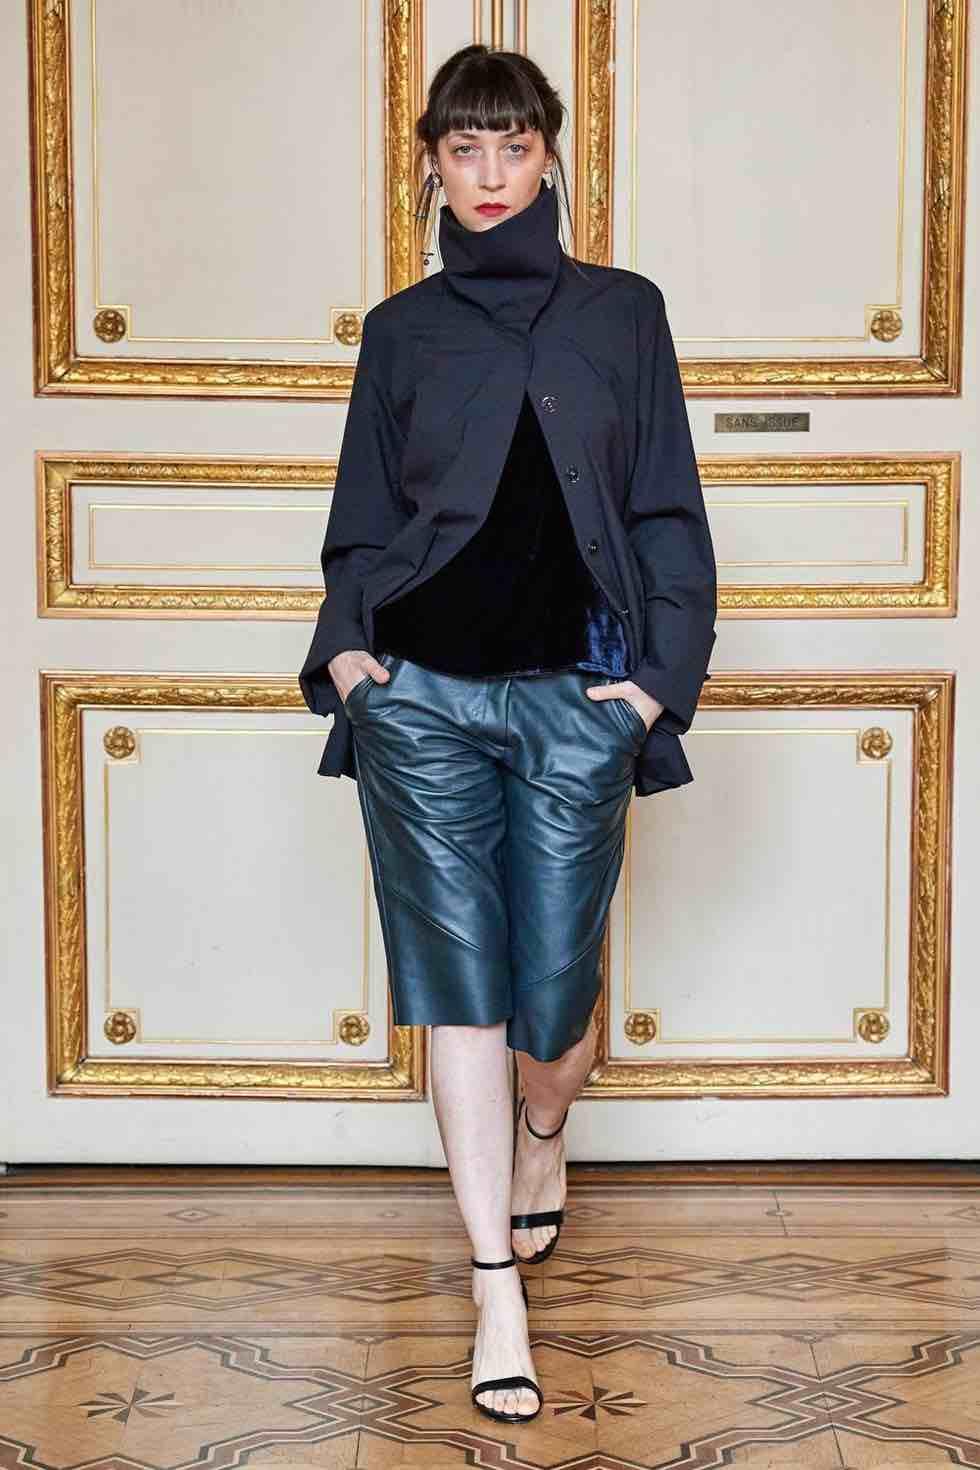 acconciatura capelli modella paris fashion week 2020